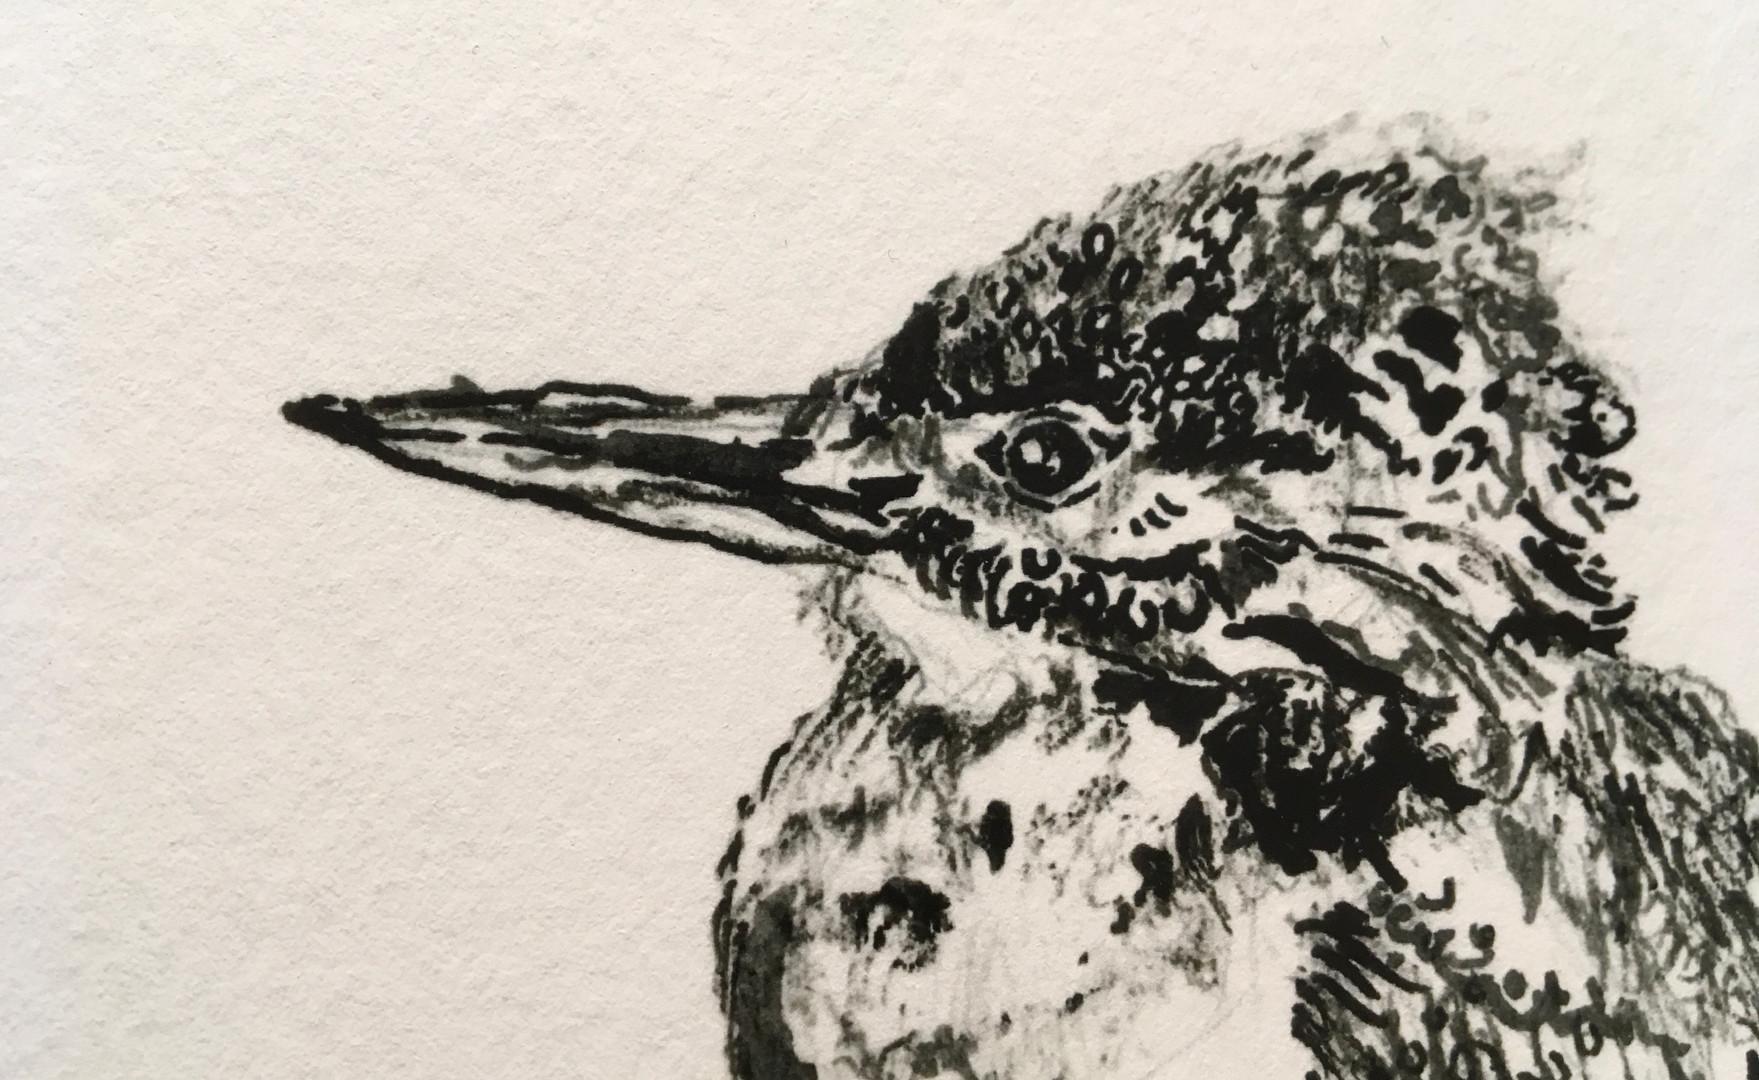 Kingfisher (close-up)